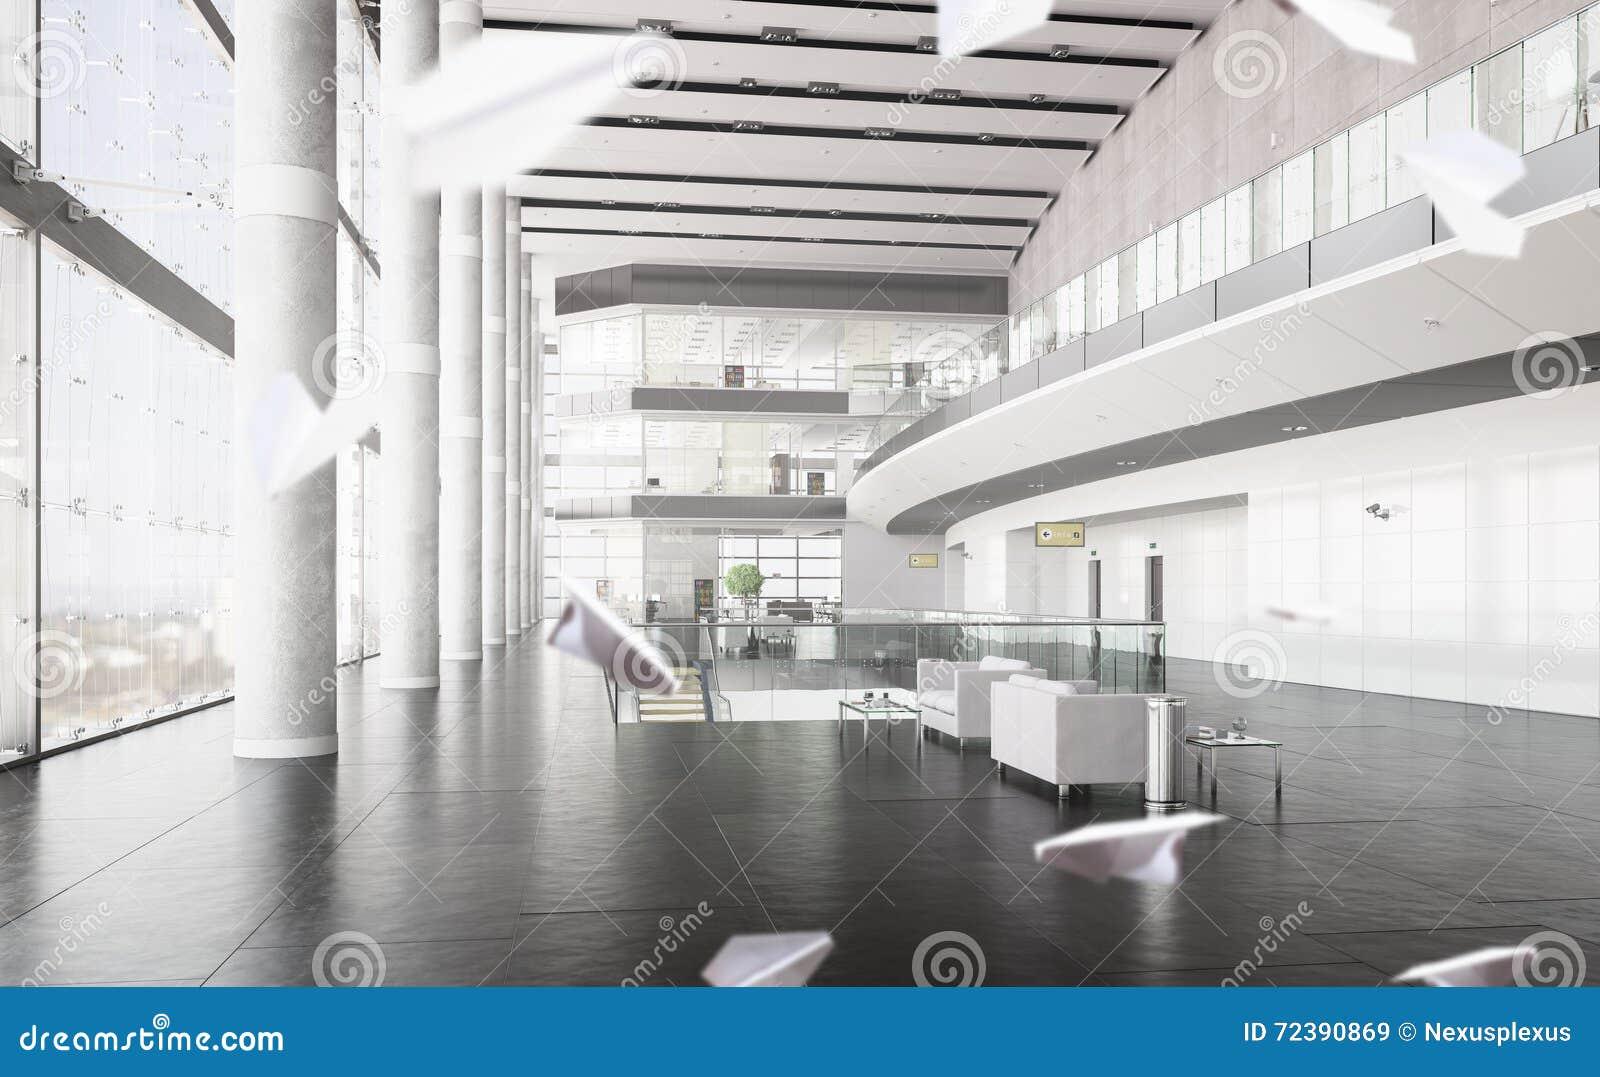 Elegant office interior stock photo image 72390869 for Sample office interior designs